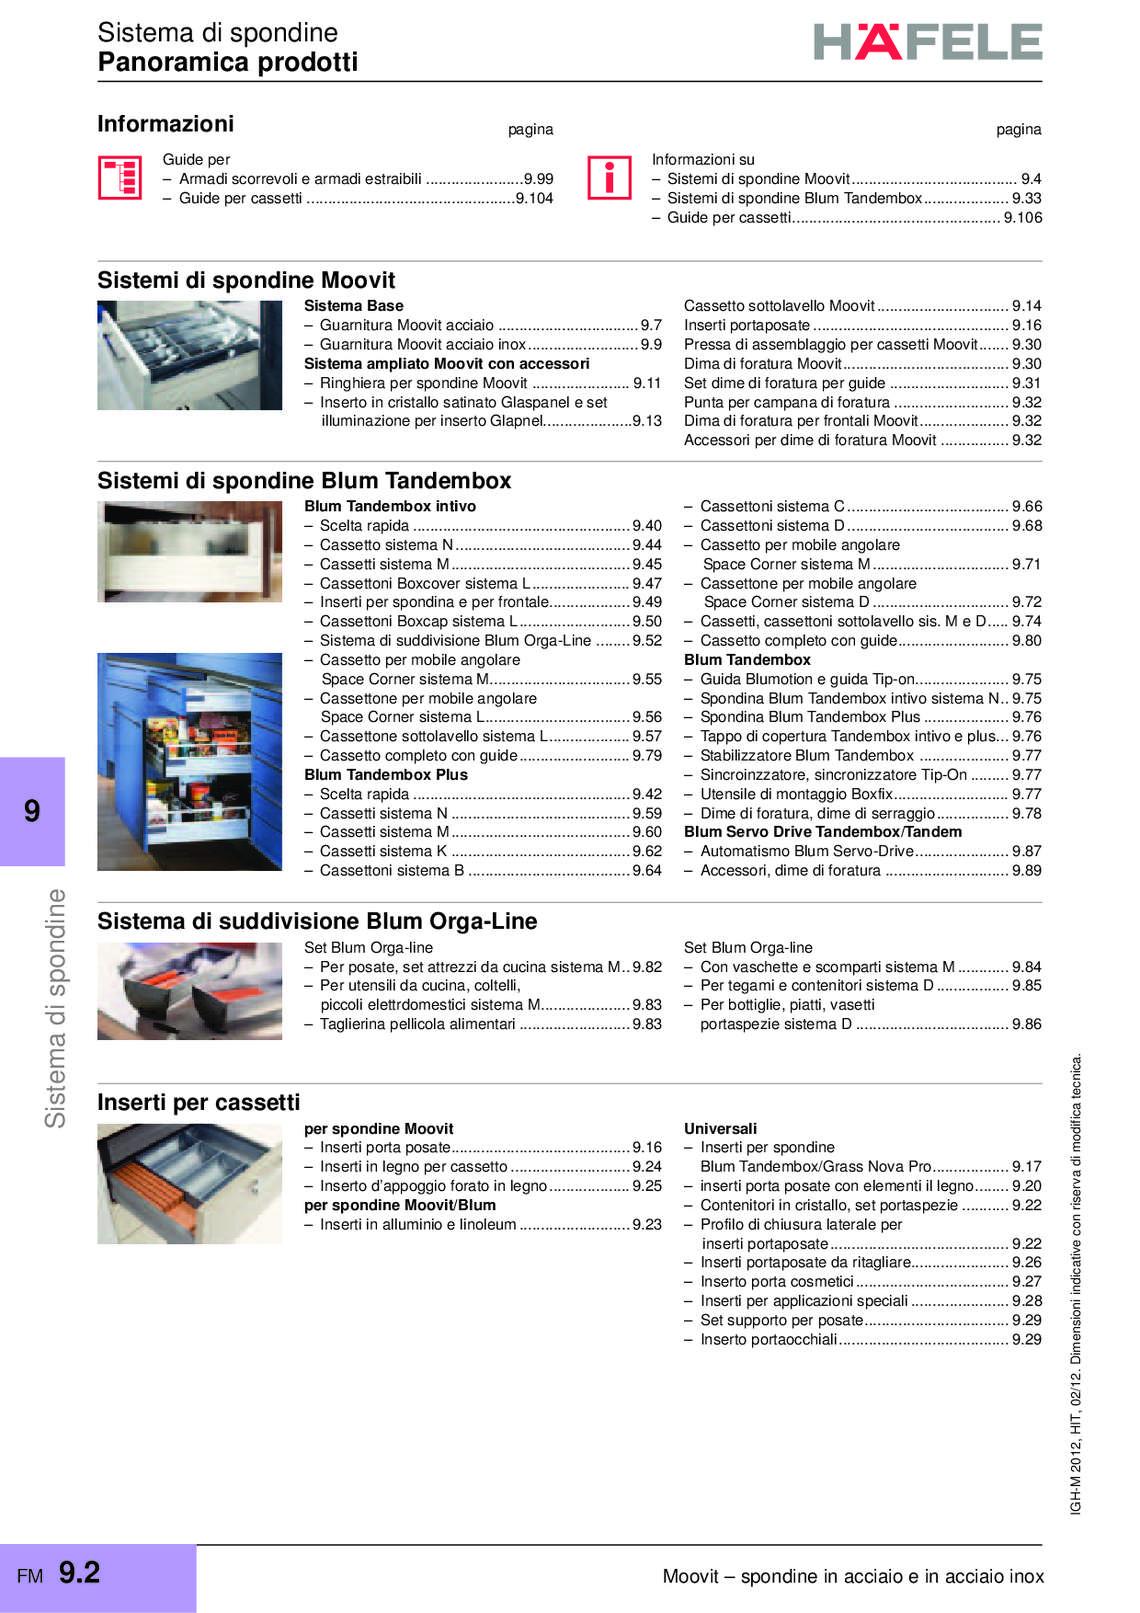 hafele-spondine-e-guide-per-mobili_40_011.jpg